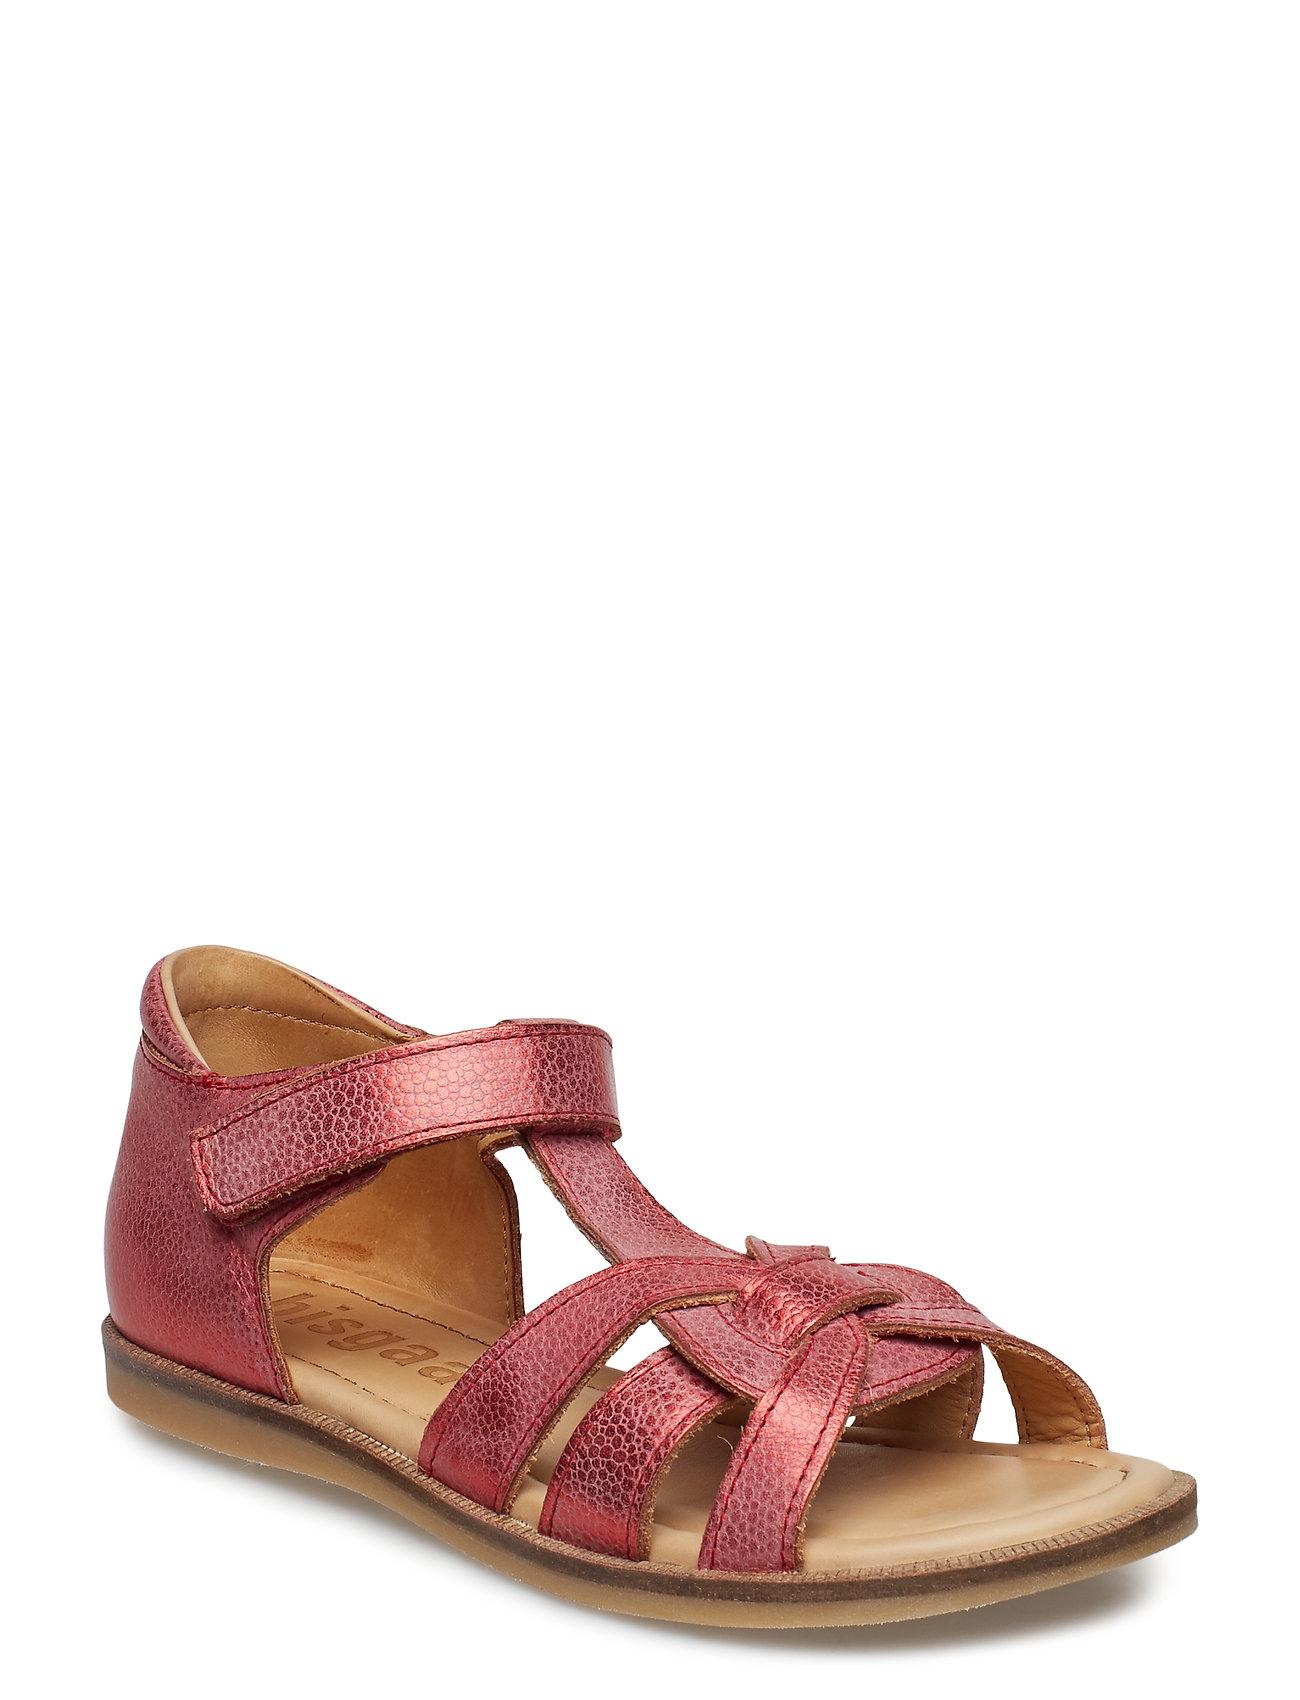 Sandal Sandaler Rød BISGAARD